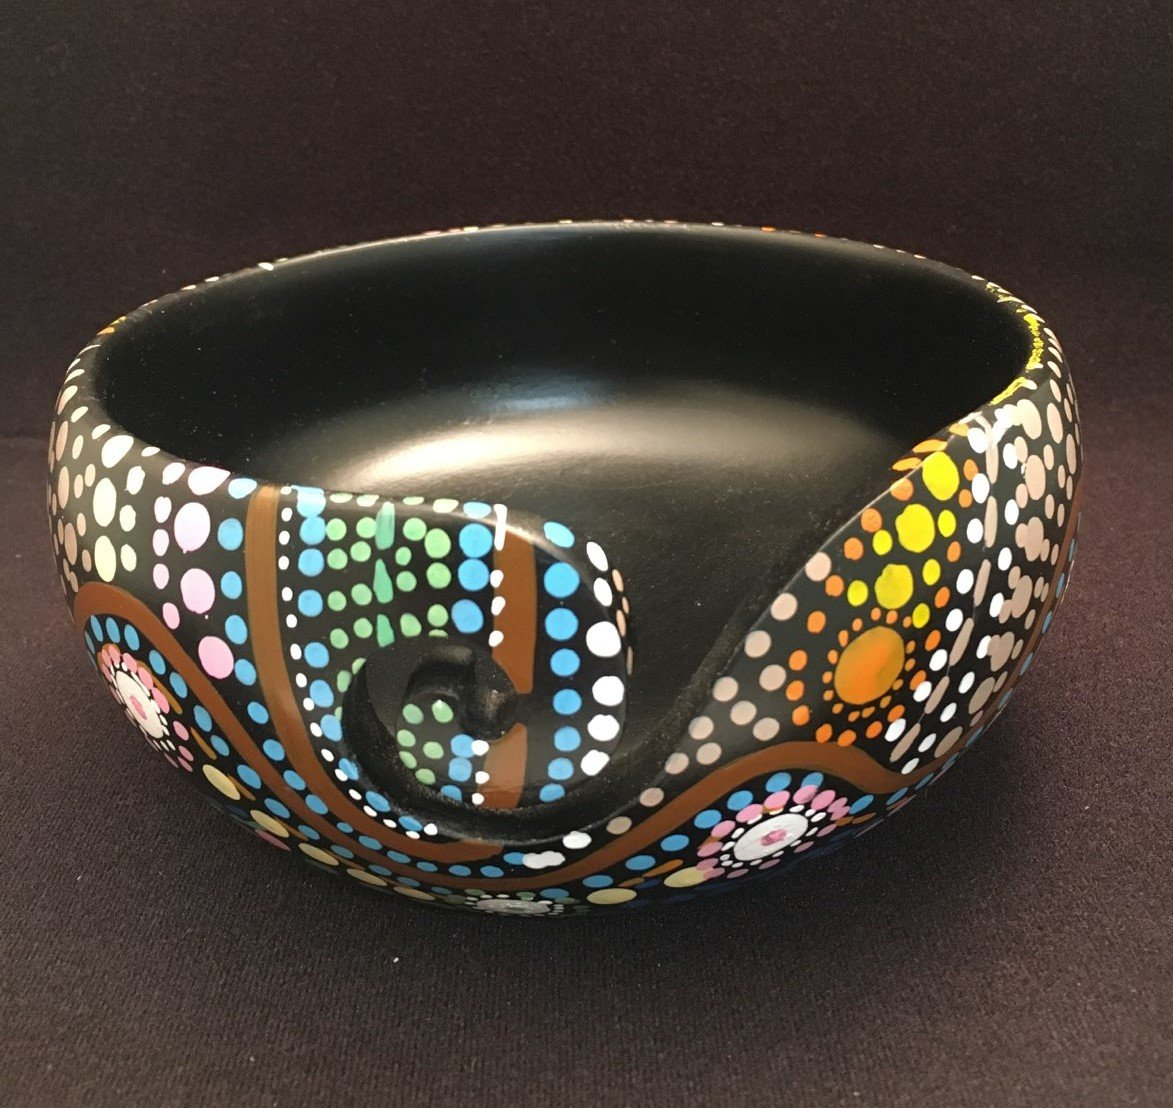 Bryson Hand Painted Yarn Bowl